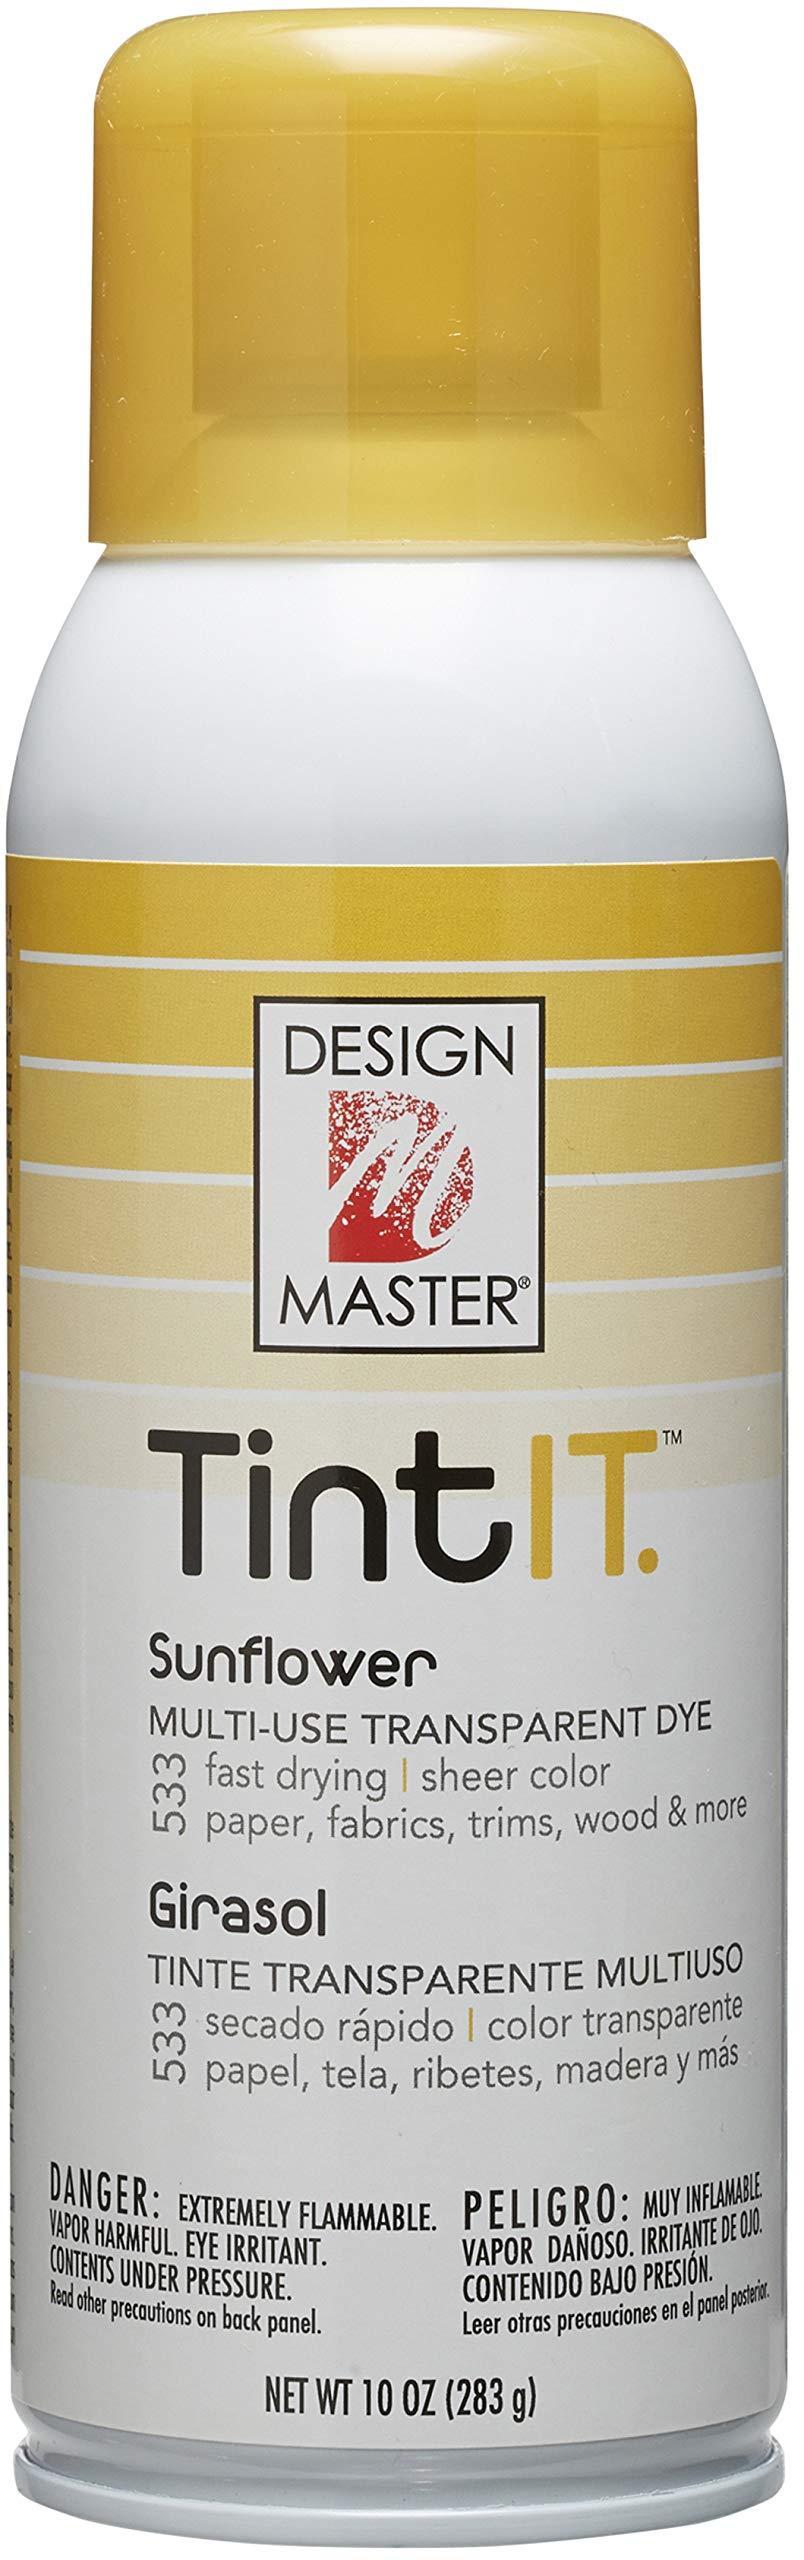 Design MASTR Tint IT Sunflower